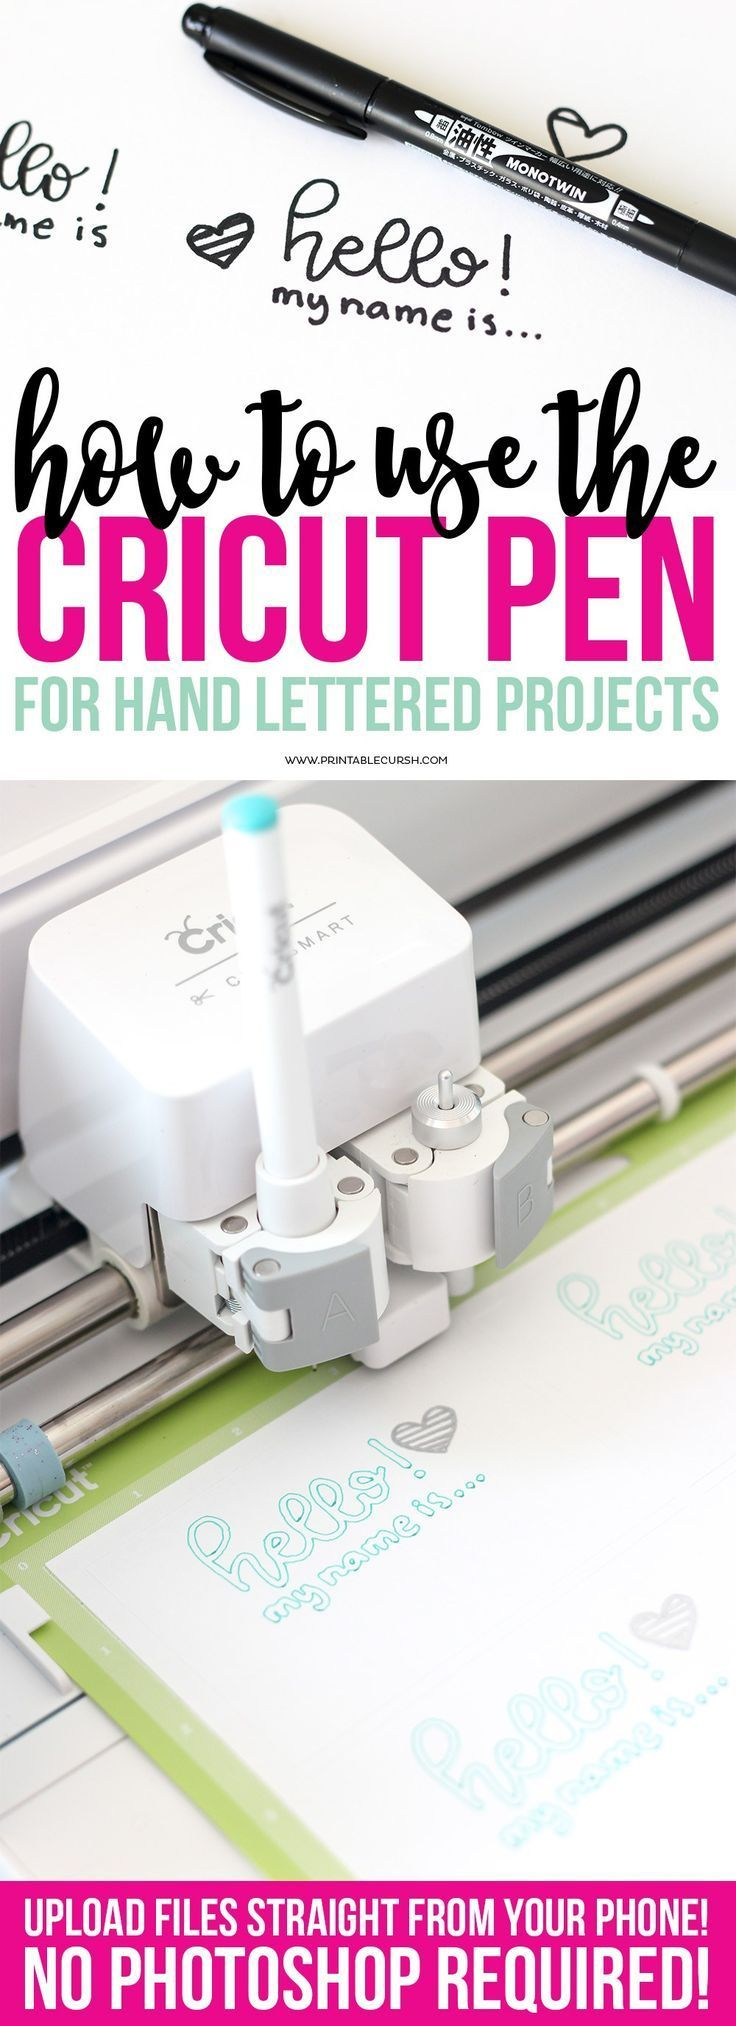 Cricut Projects - Hand-Lettering Using Cricut Pens #cricutcrafts